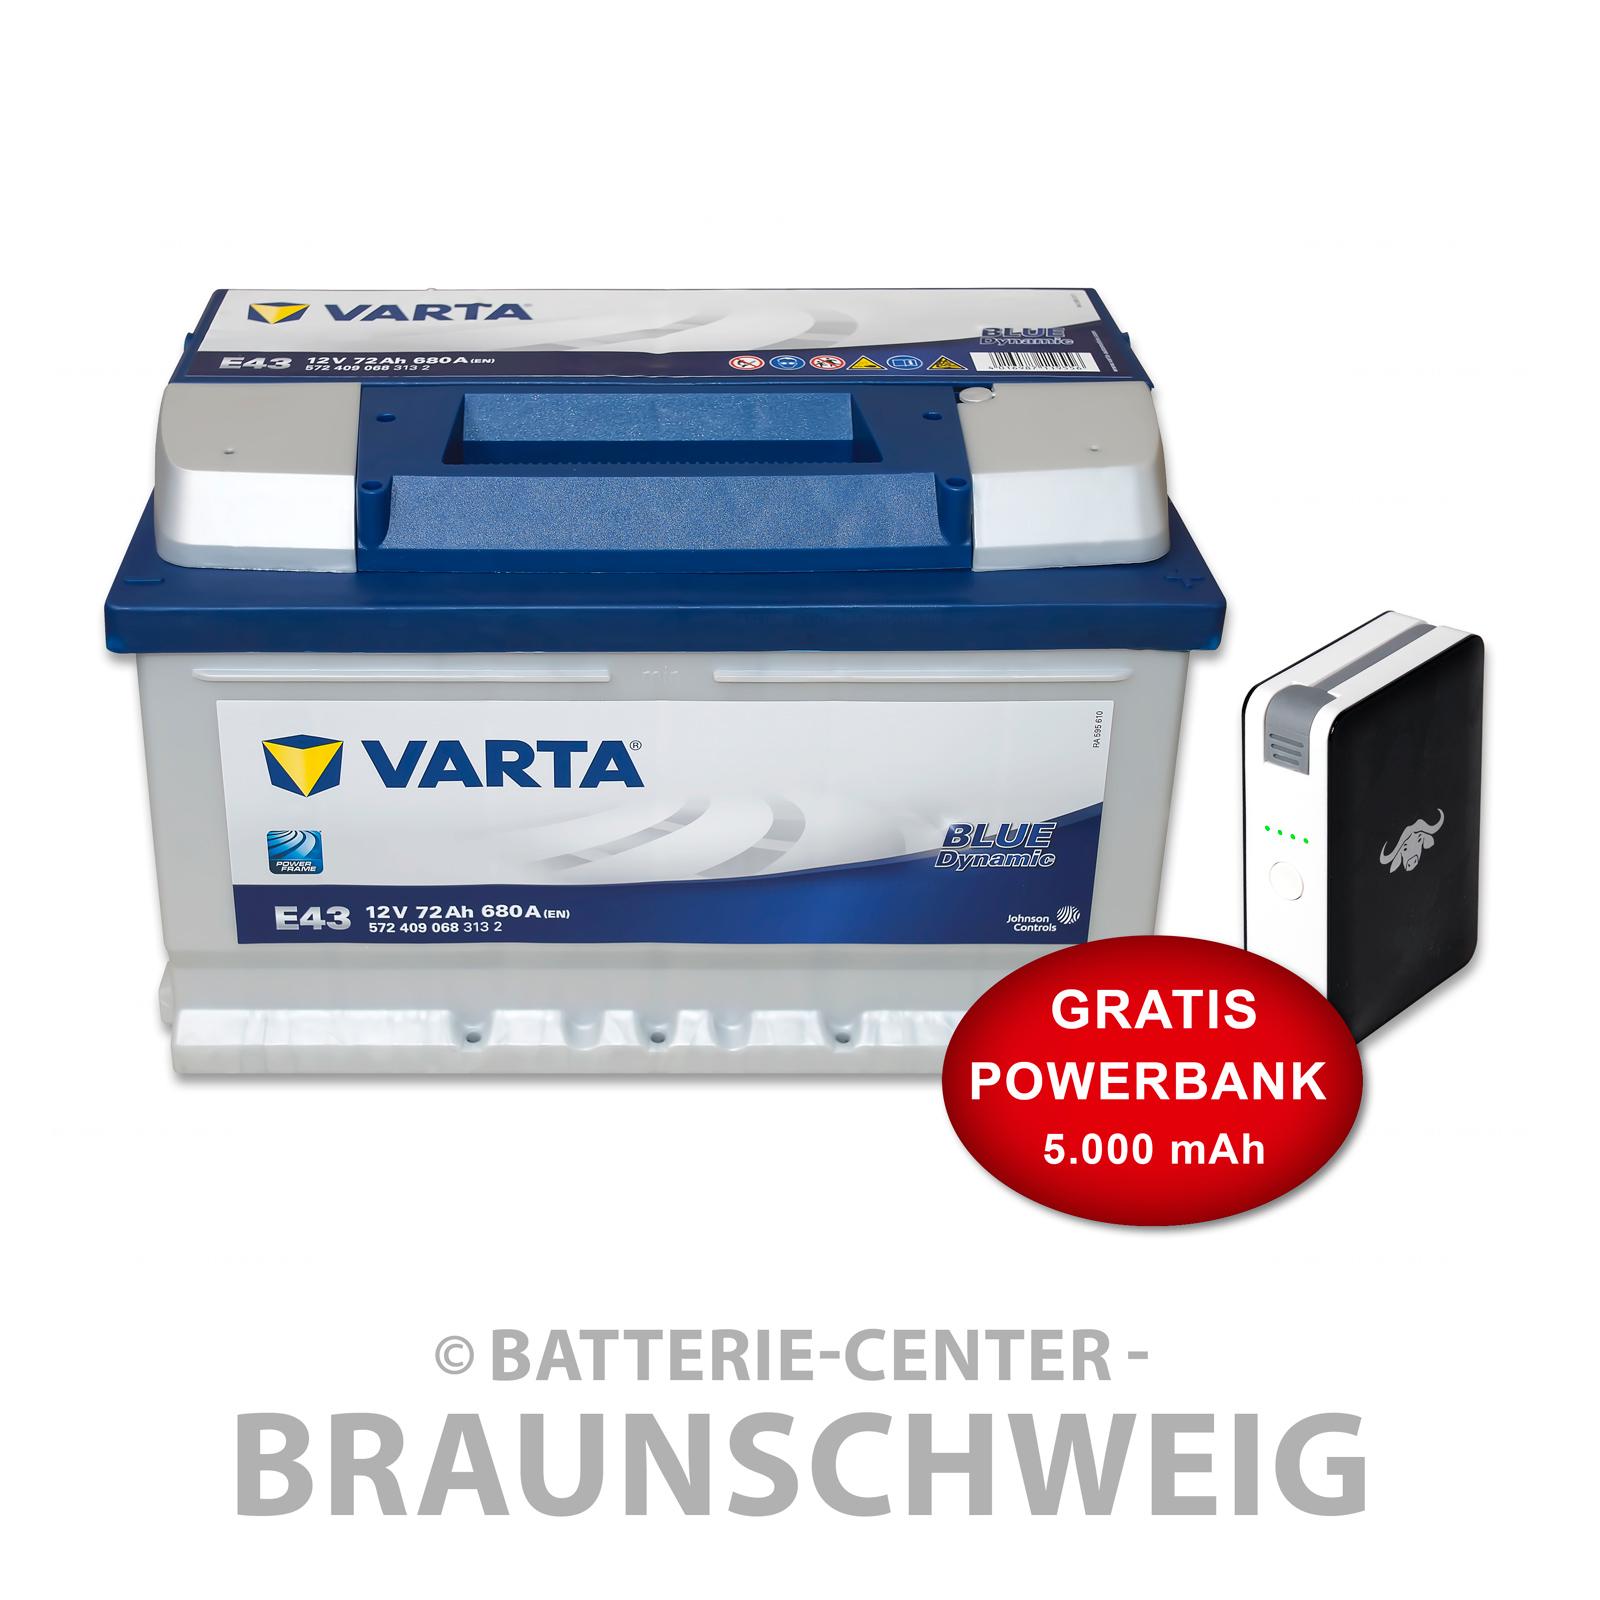 autobatterie e43 12 v 72 ah 680 a en varta blue kfz inkl 5 ah powerbank ebay. Black Bedroom Furniture Sets. Home Design Ideas